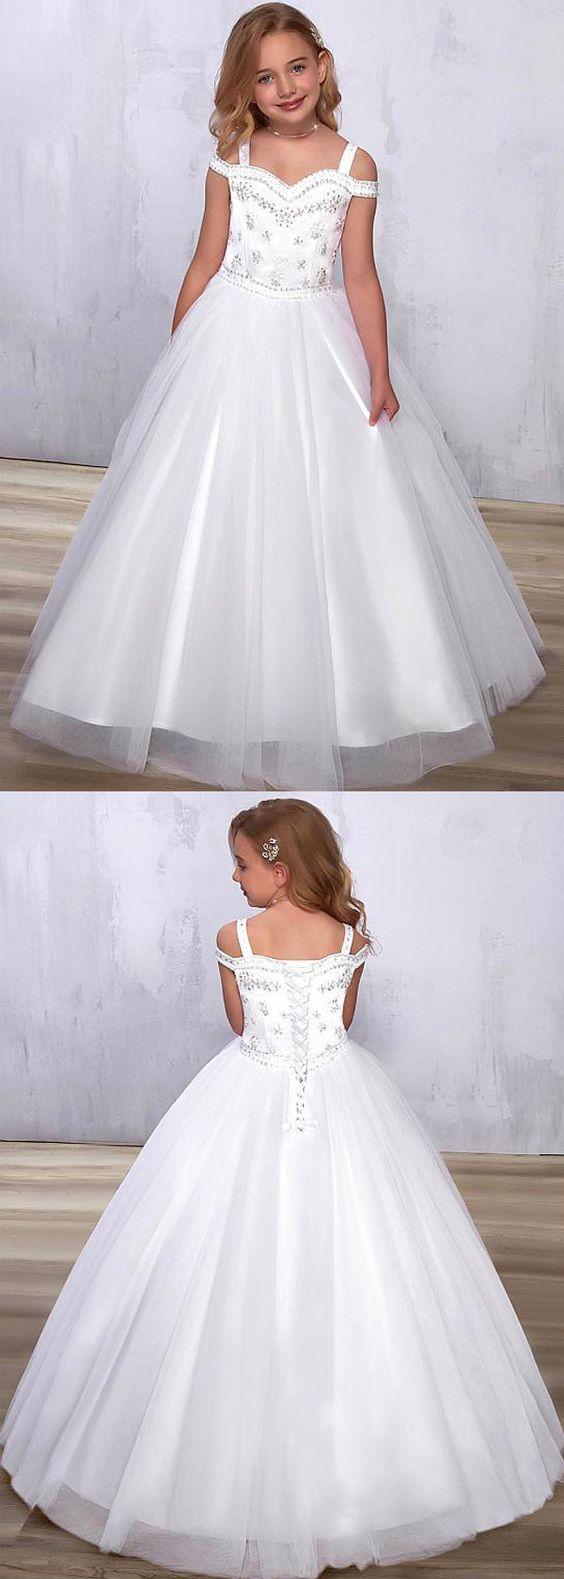 Stunning Tulle Sweetheart Neckline A-line Flower Girl Dress With Beadings